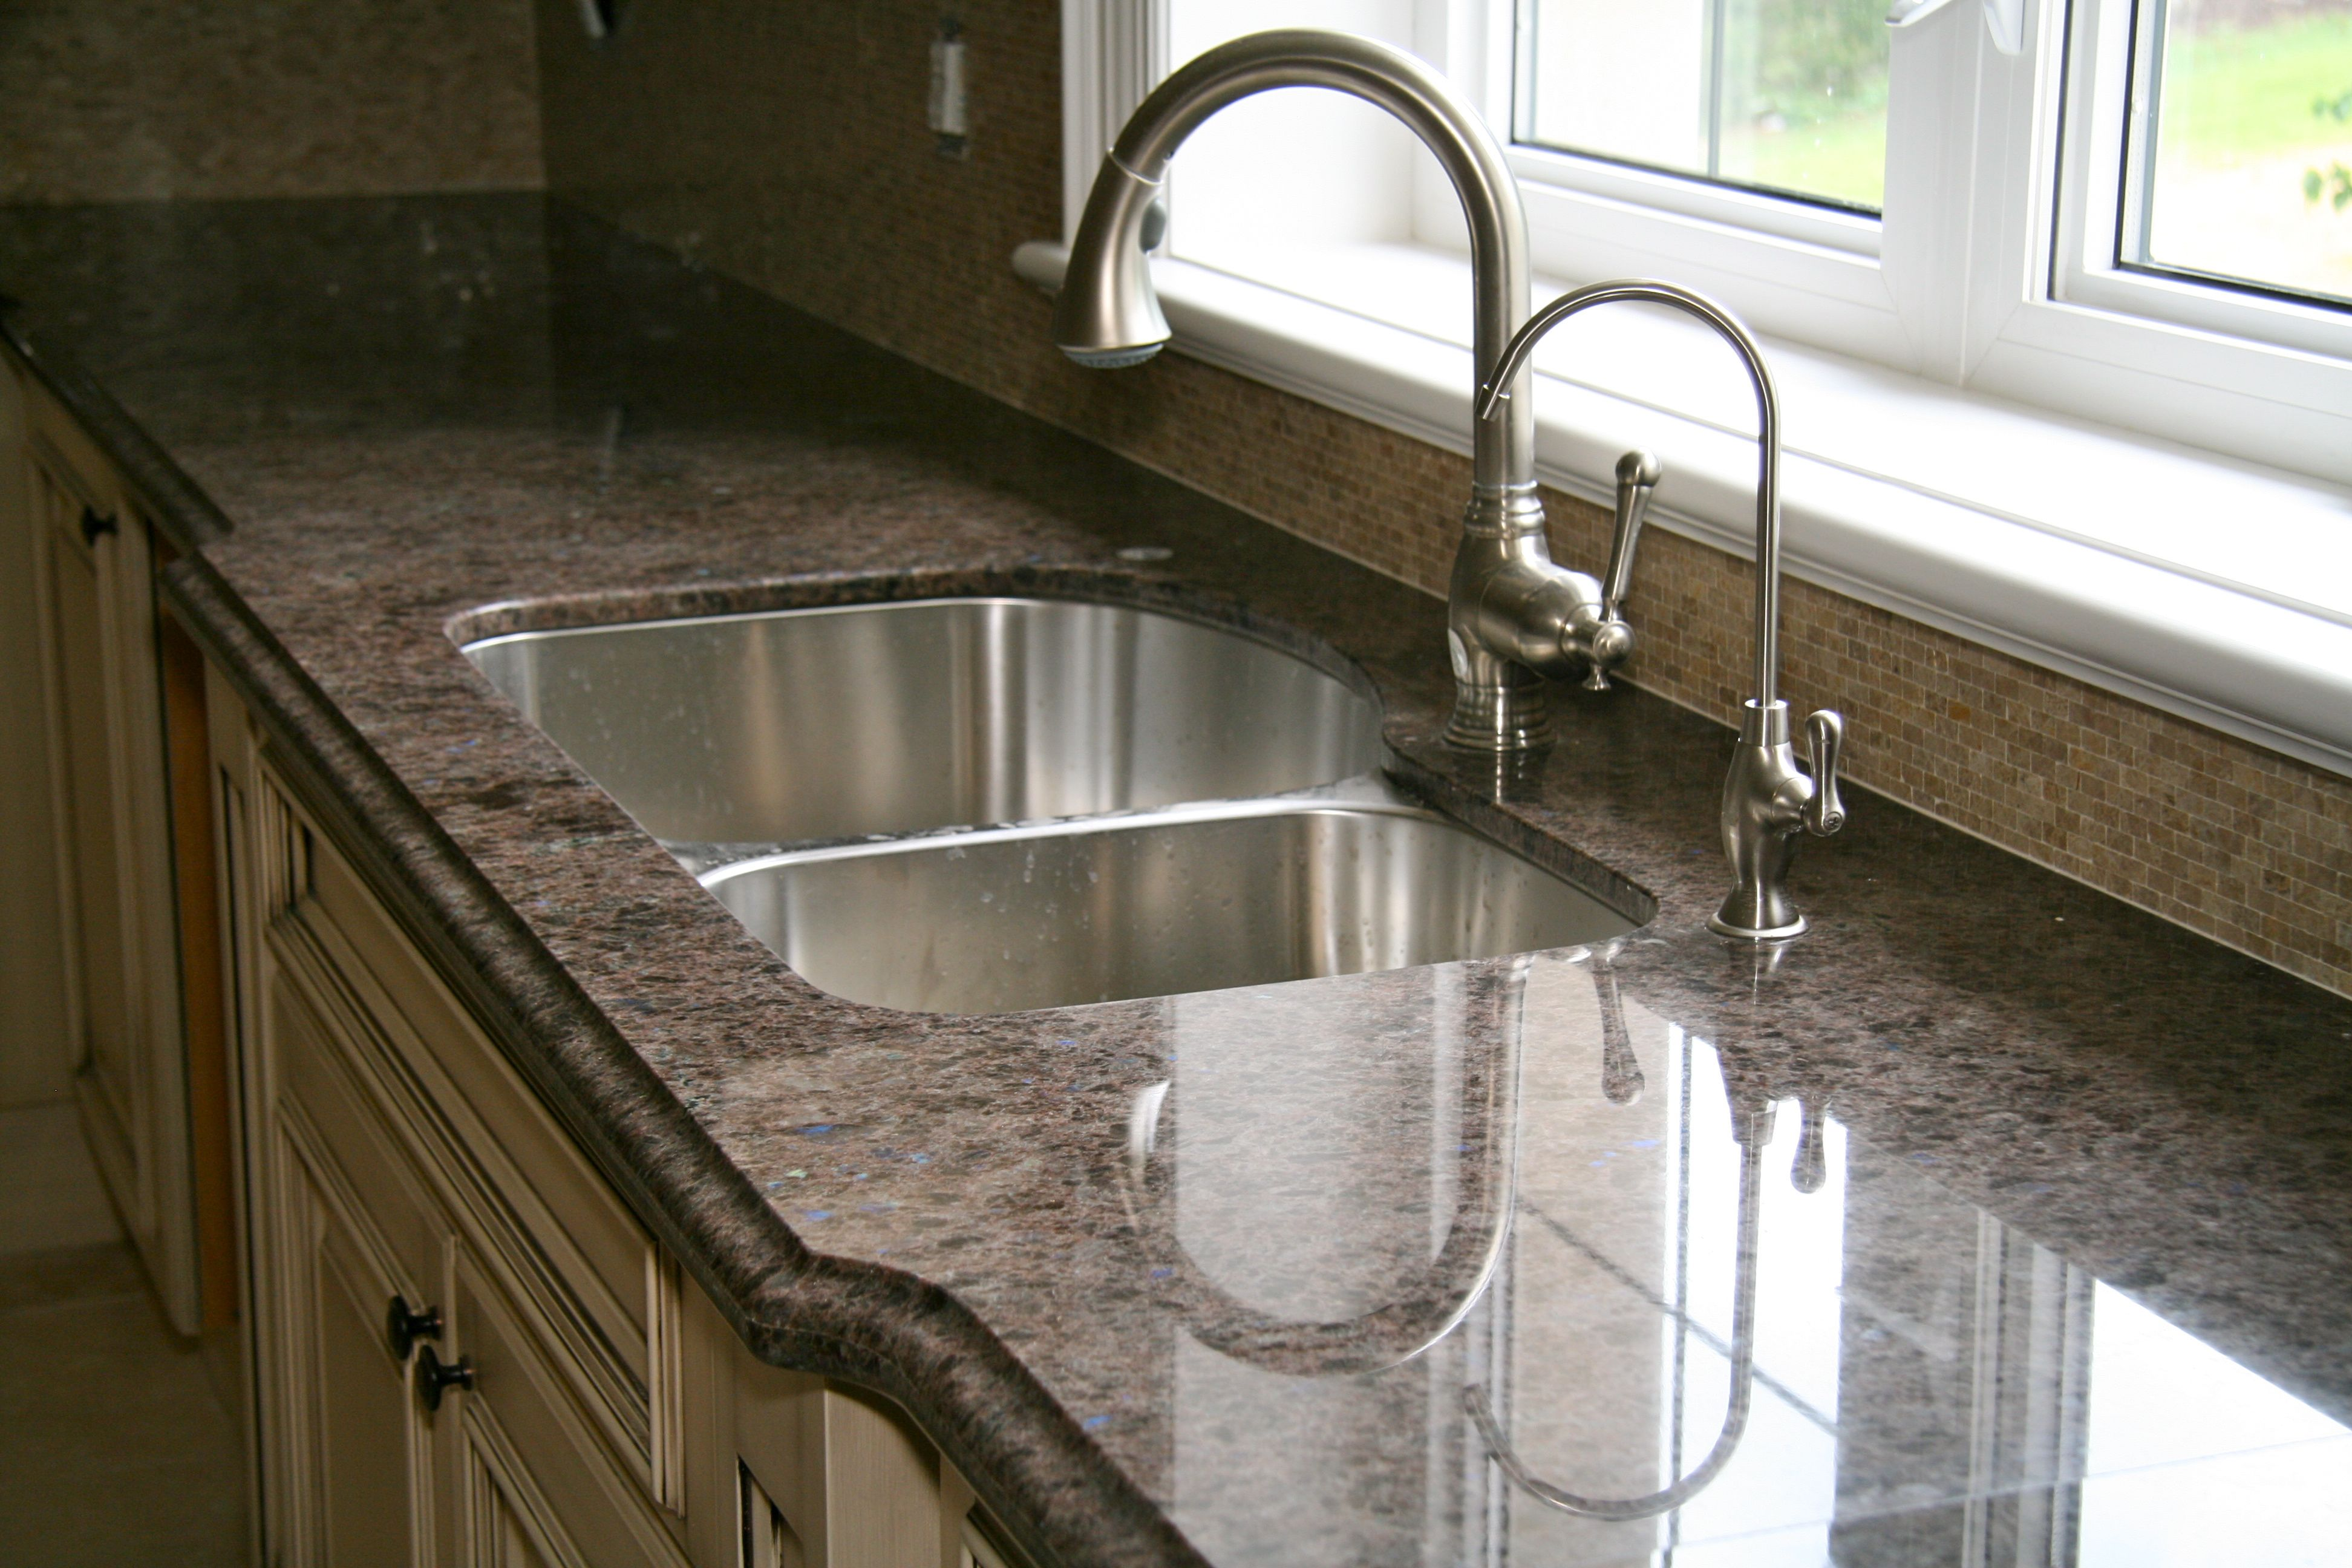 Labrador Antique Granite Www.marbleandmarble.com #labradorantique #granite  #kitchen #faucet